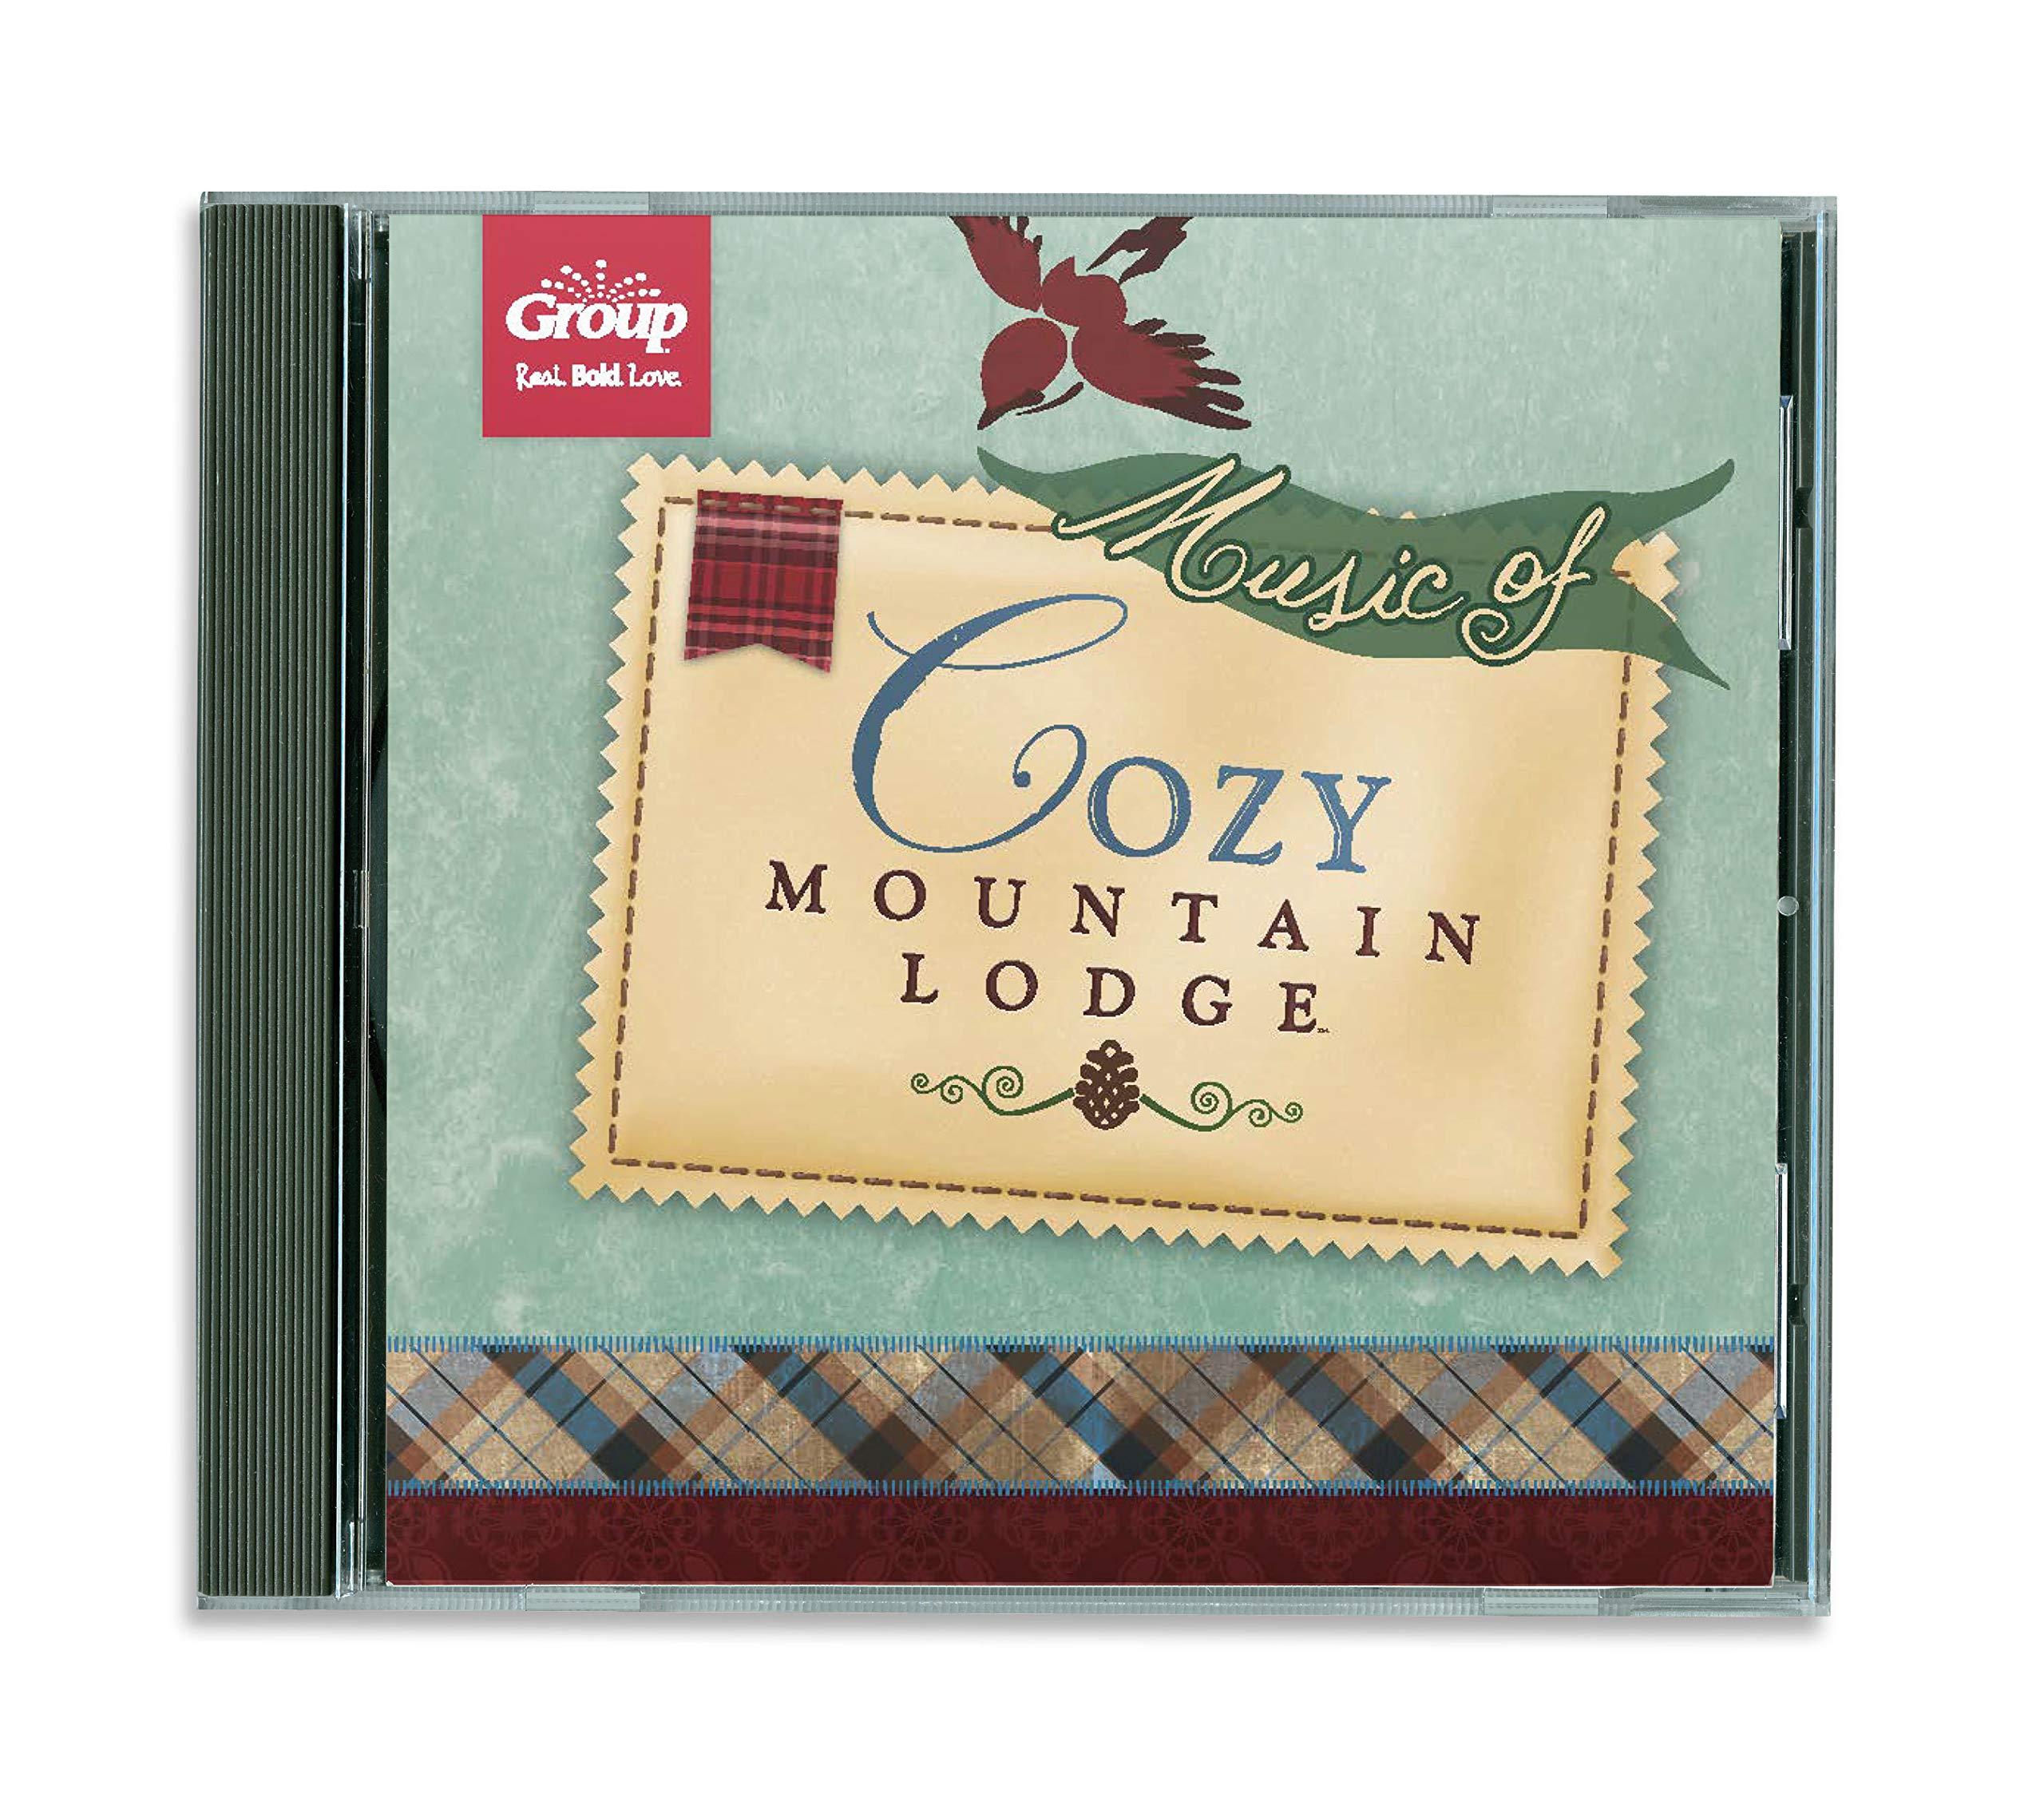 Music of Cozy Mountain Lodge (retreat program music): Group